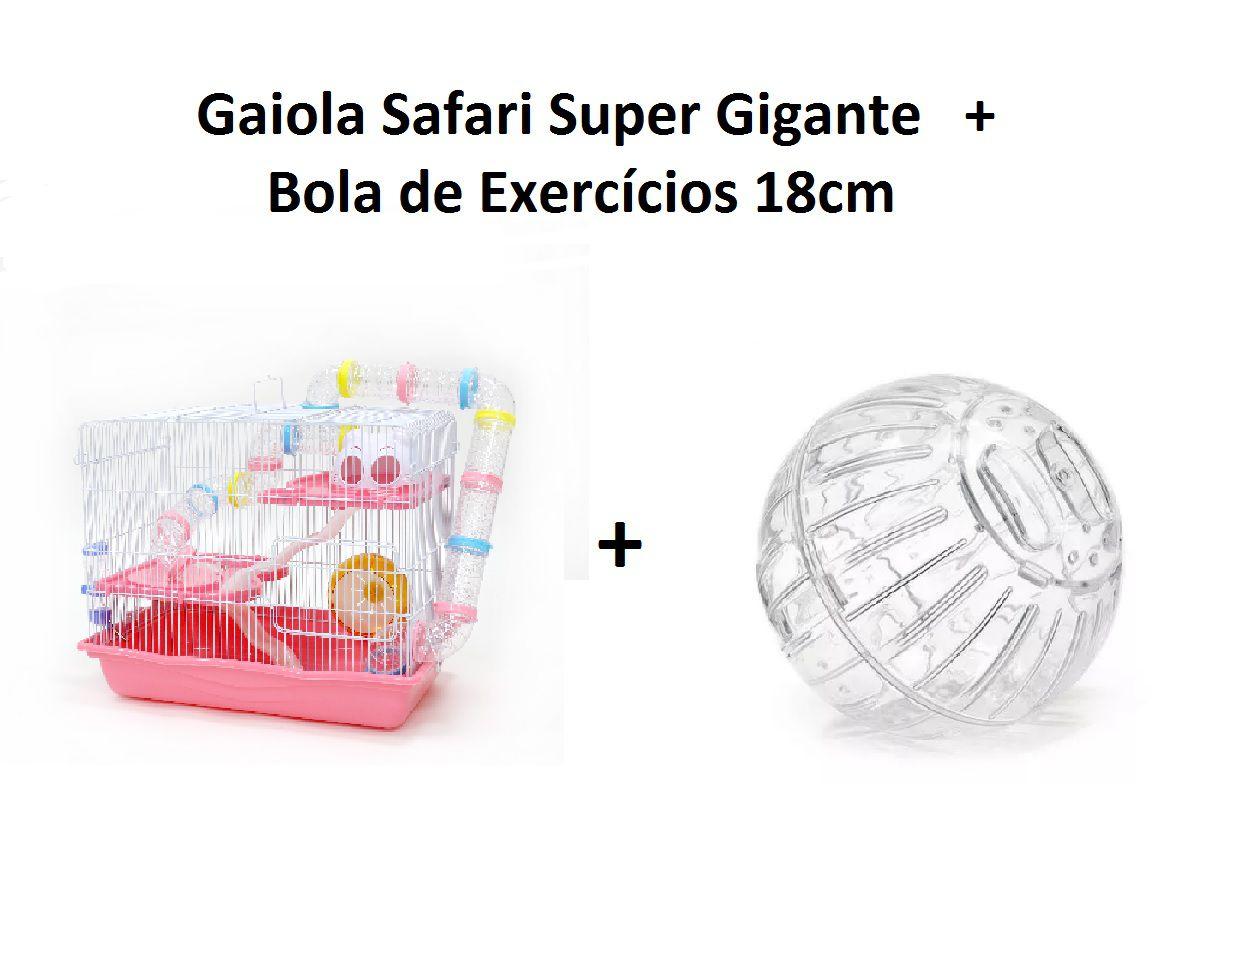 Kit Gaiola Safari Super Gigante Rosa + Bola de Exercícios 18cm